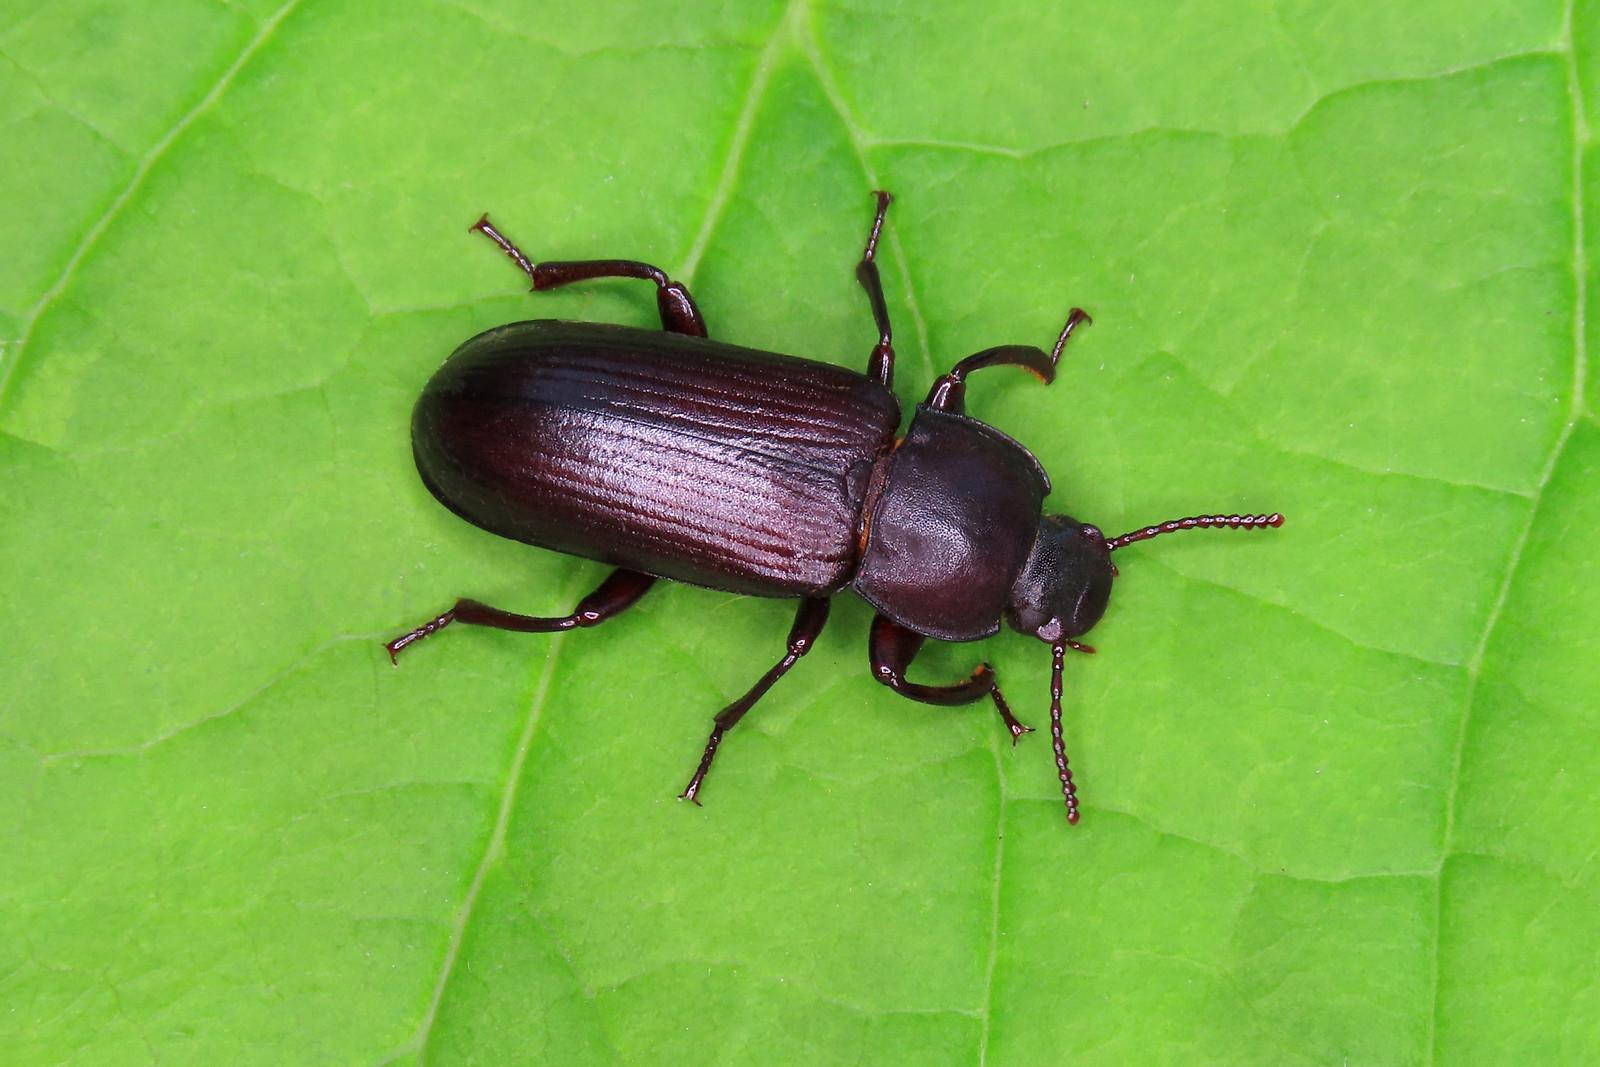 Mealworm Beetle - Tenebrio molitor [A]